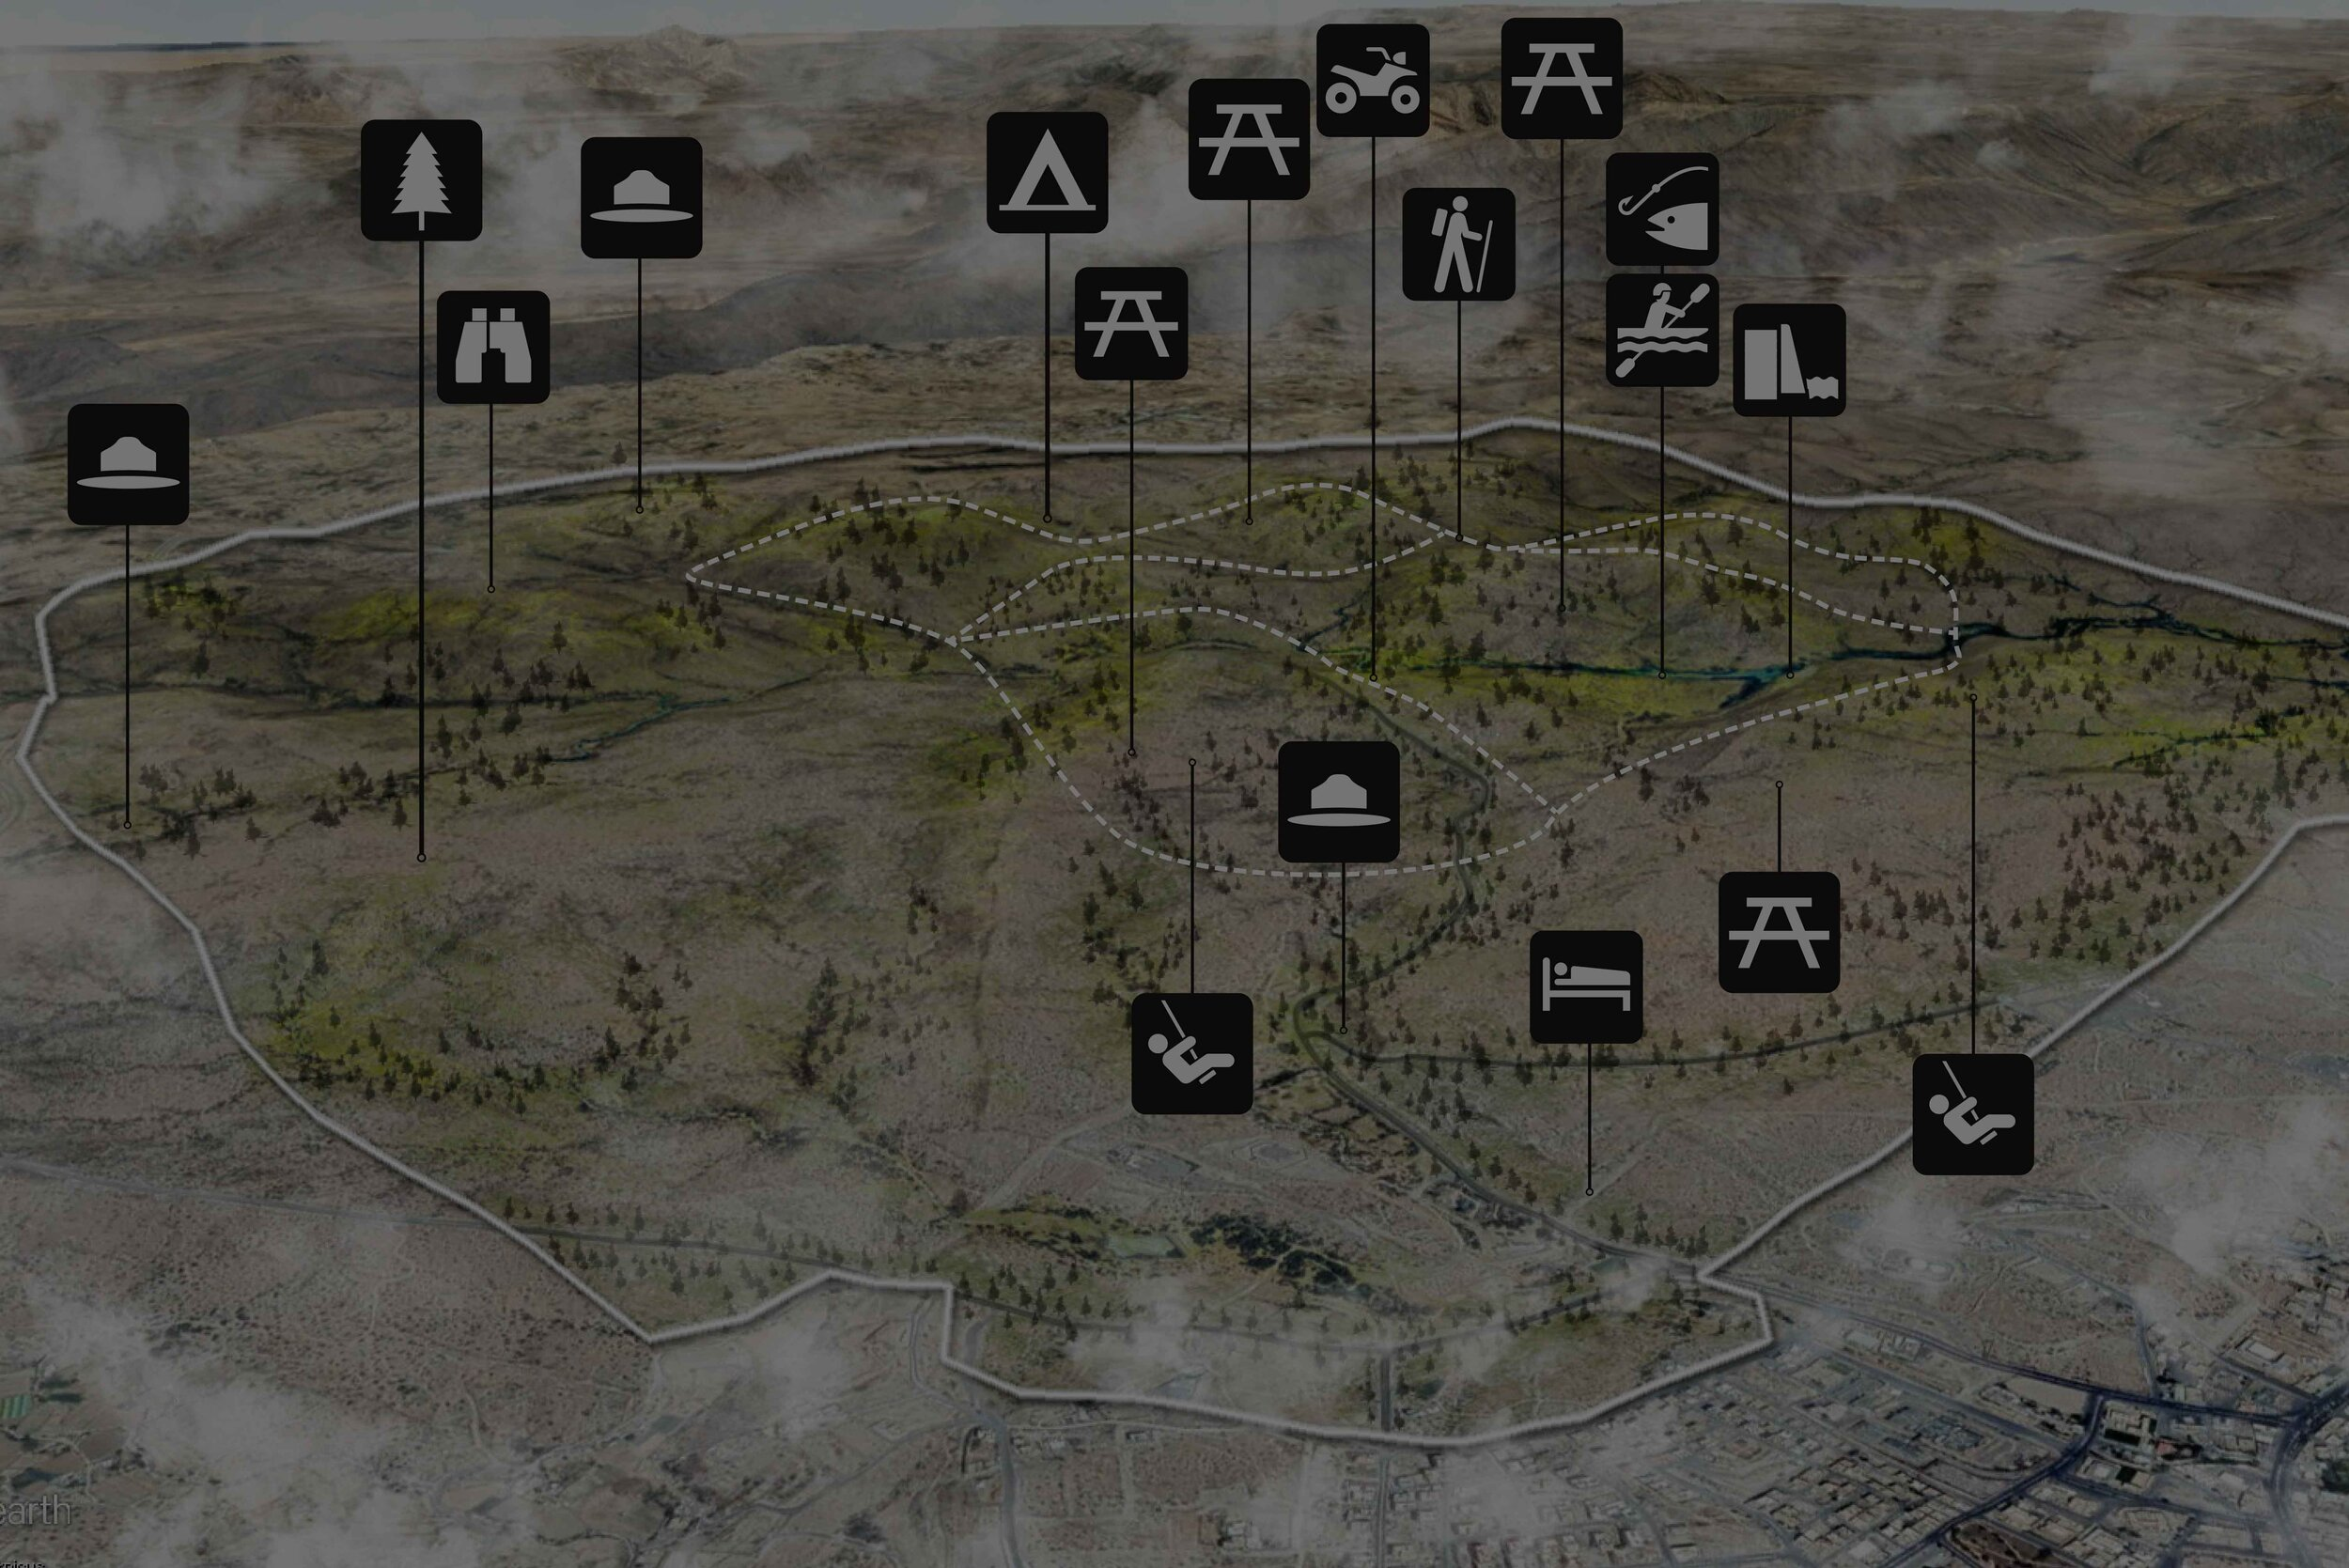 KSA-National-Parks-Master-Plan-2.jpg